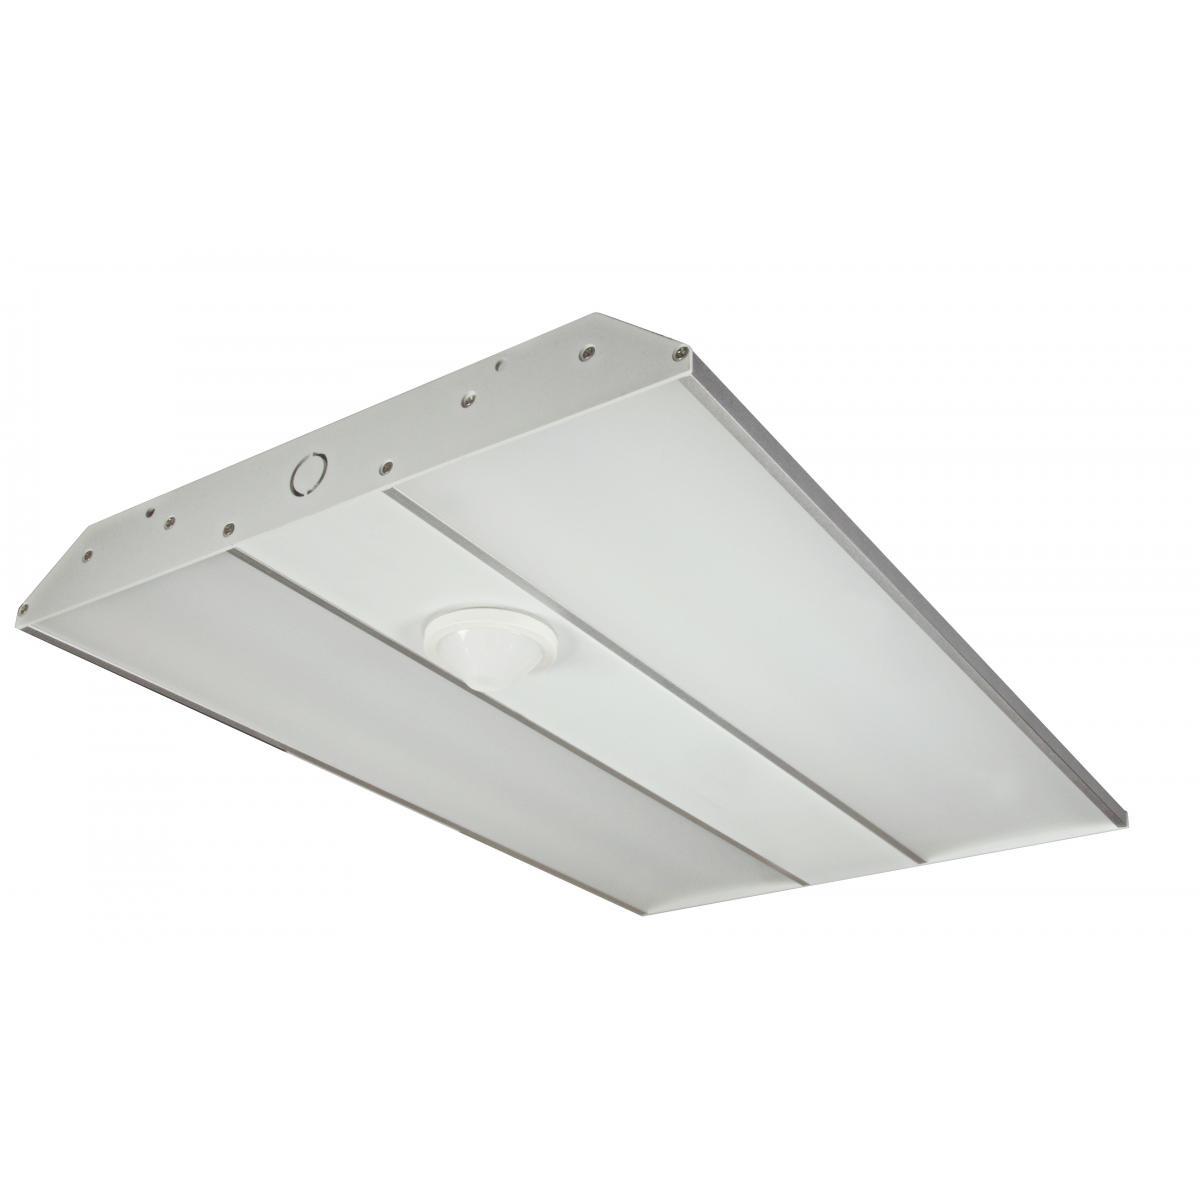 62-1072 100W LED 2 FT. LINEAR HI-BAY